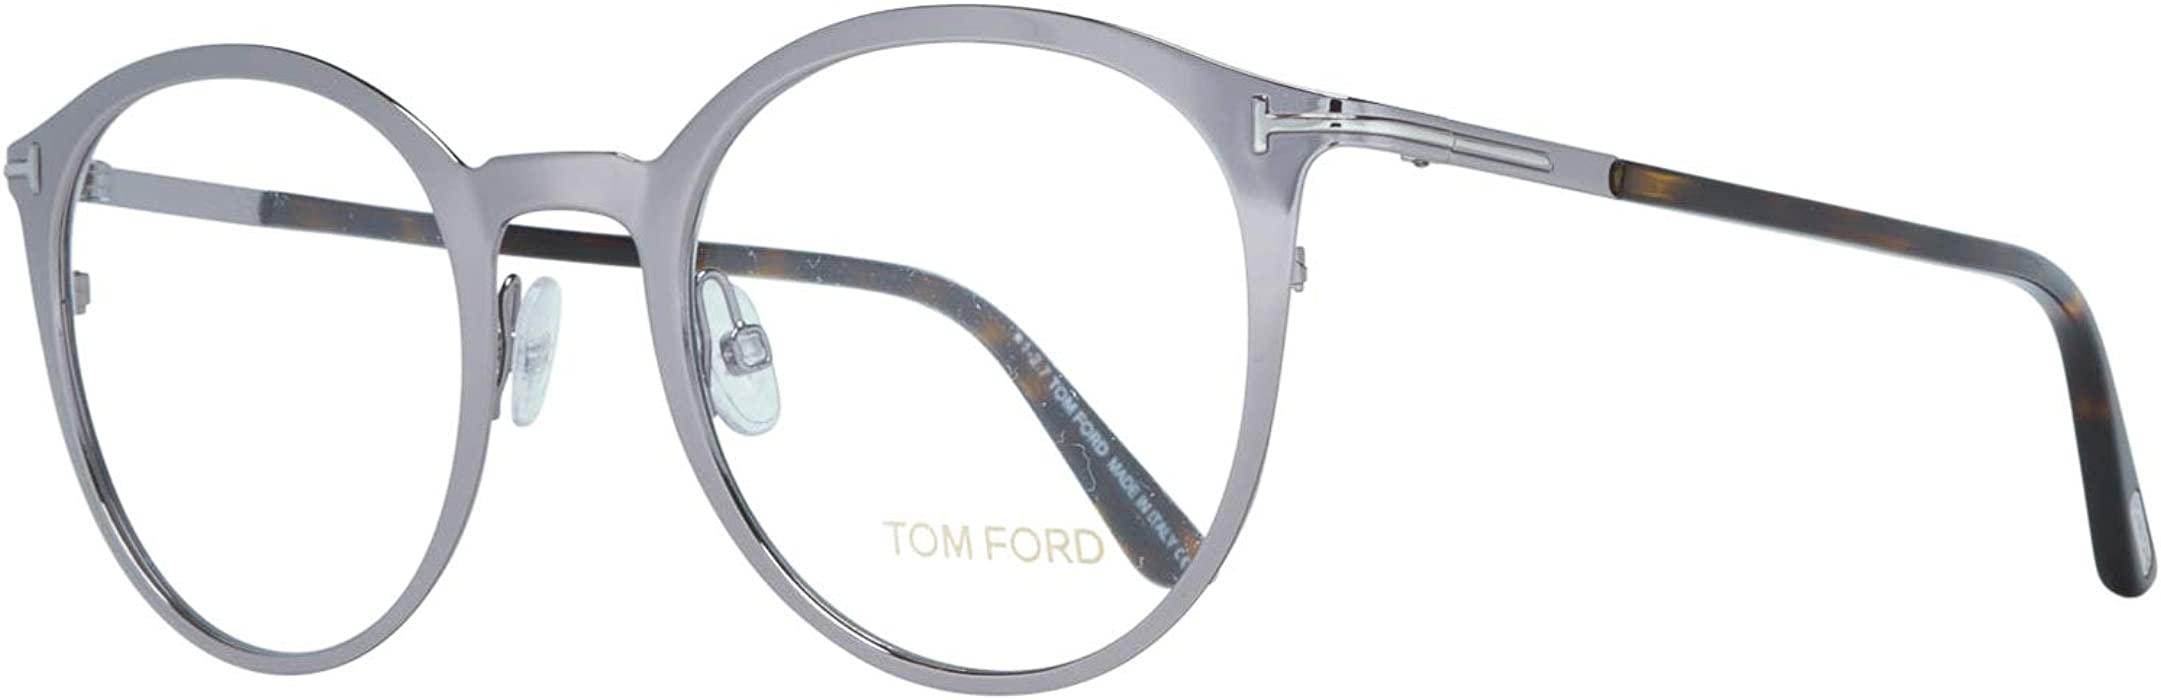 bda1892405 Tom Ford Oval Eyeglasses TF5465 014 Light Ruthenium/Havana 50mm FT5465